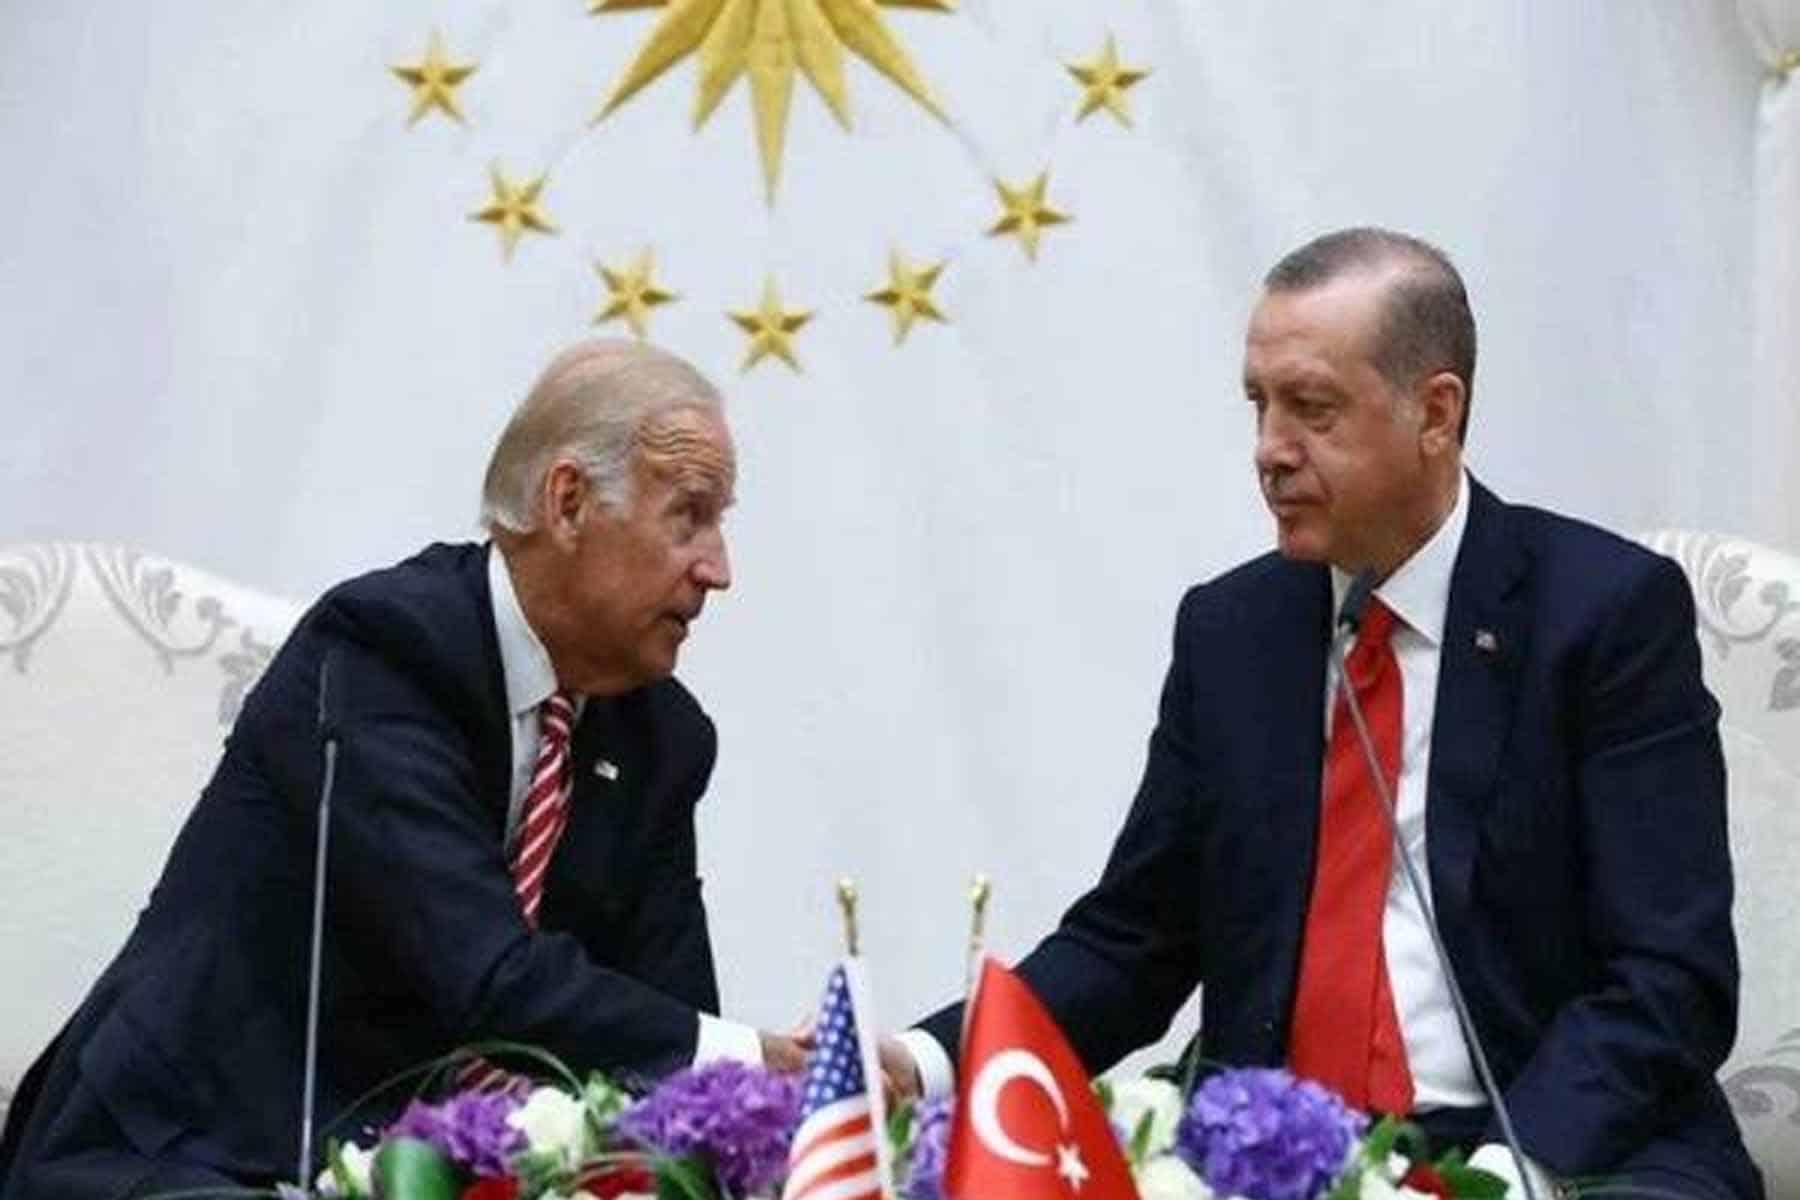 Biden akhirnya tunduk kepada Erdogan